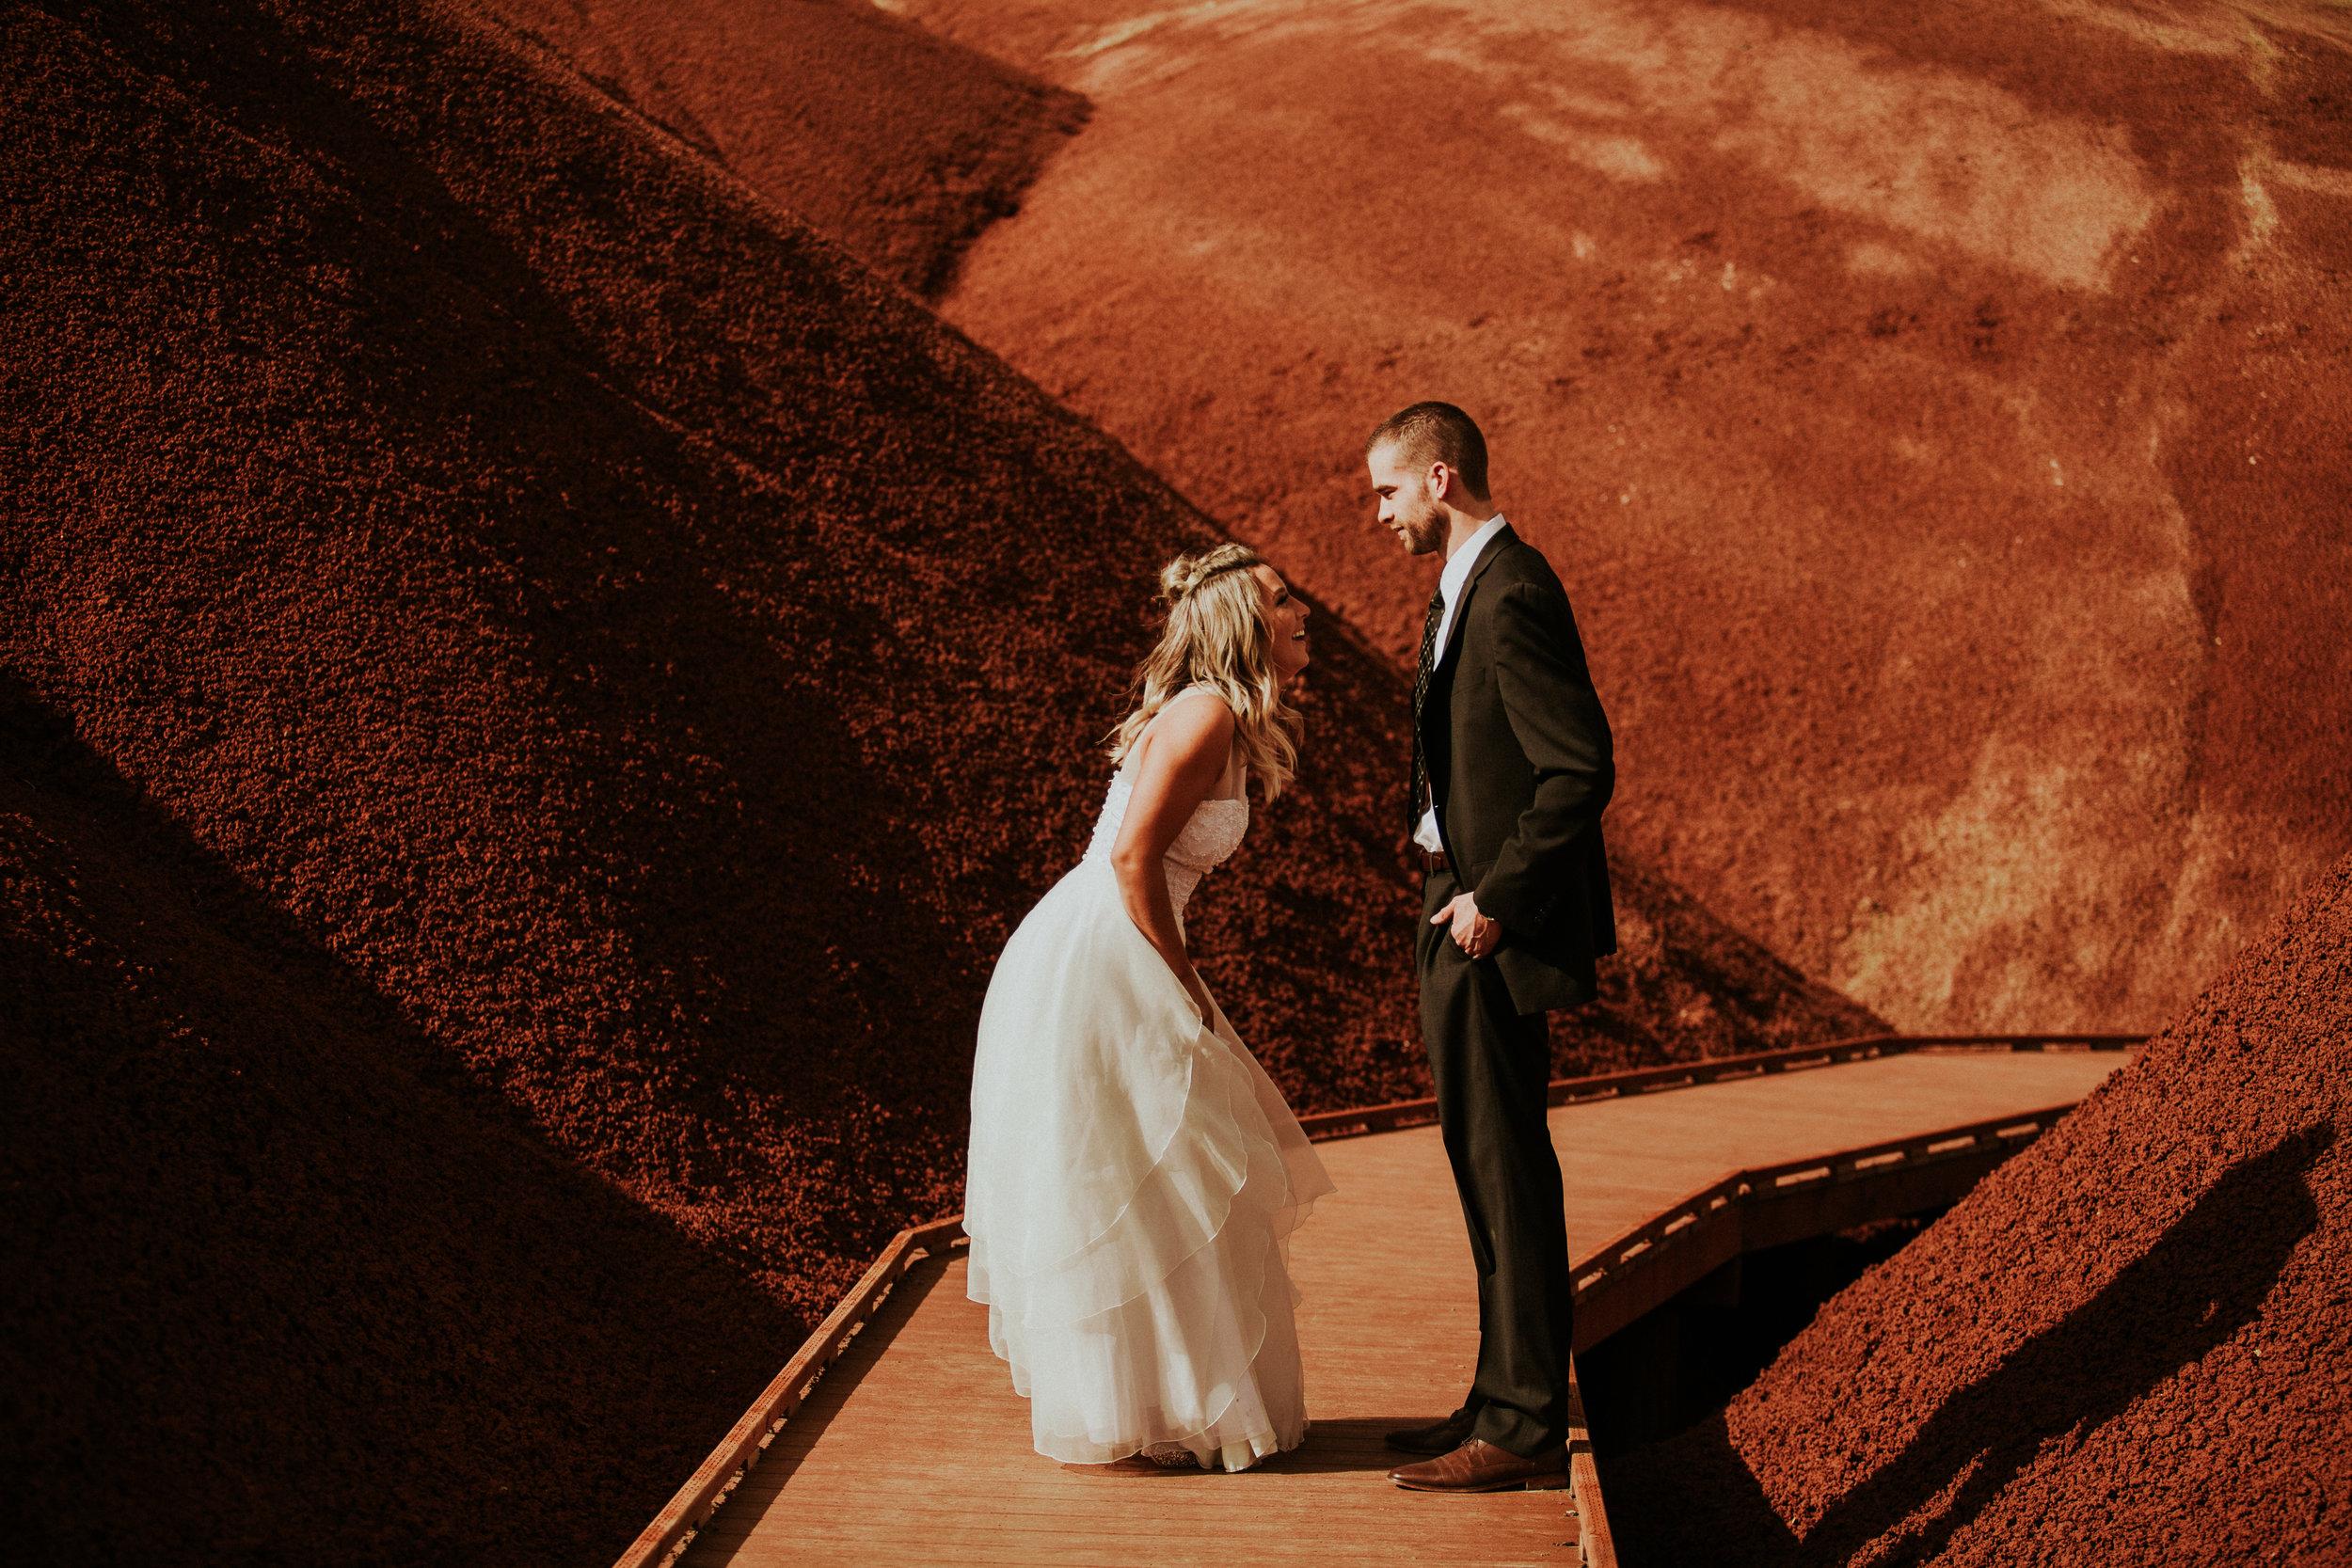 Port-orchard-wedding-photographer-cedar-springs-bride-and-groom -149.jpg